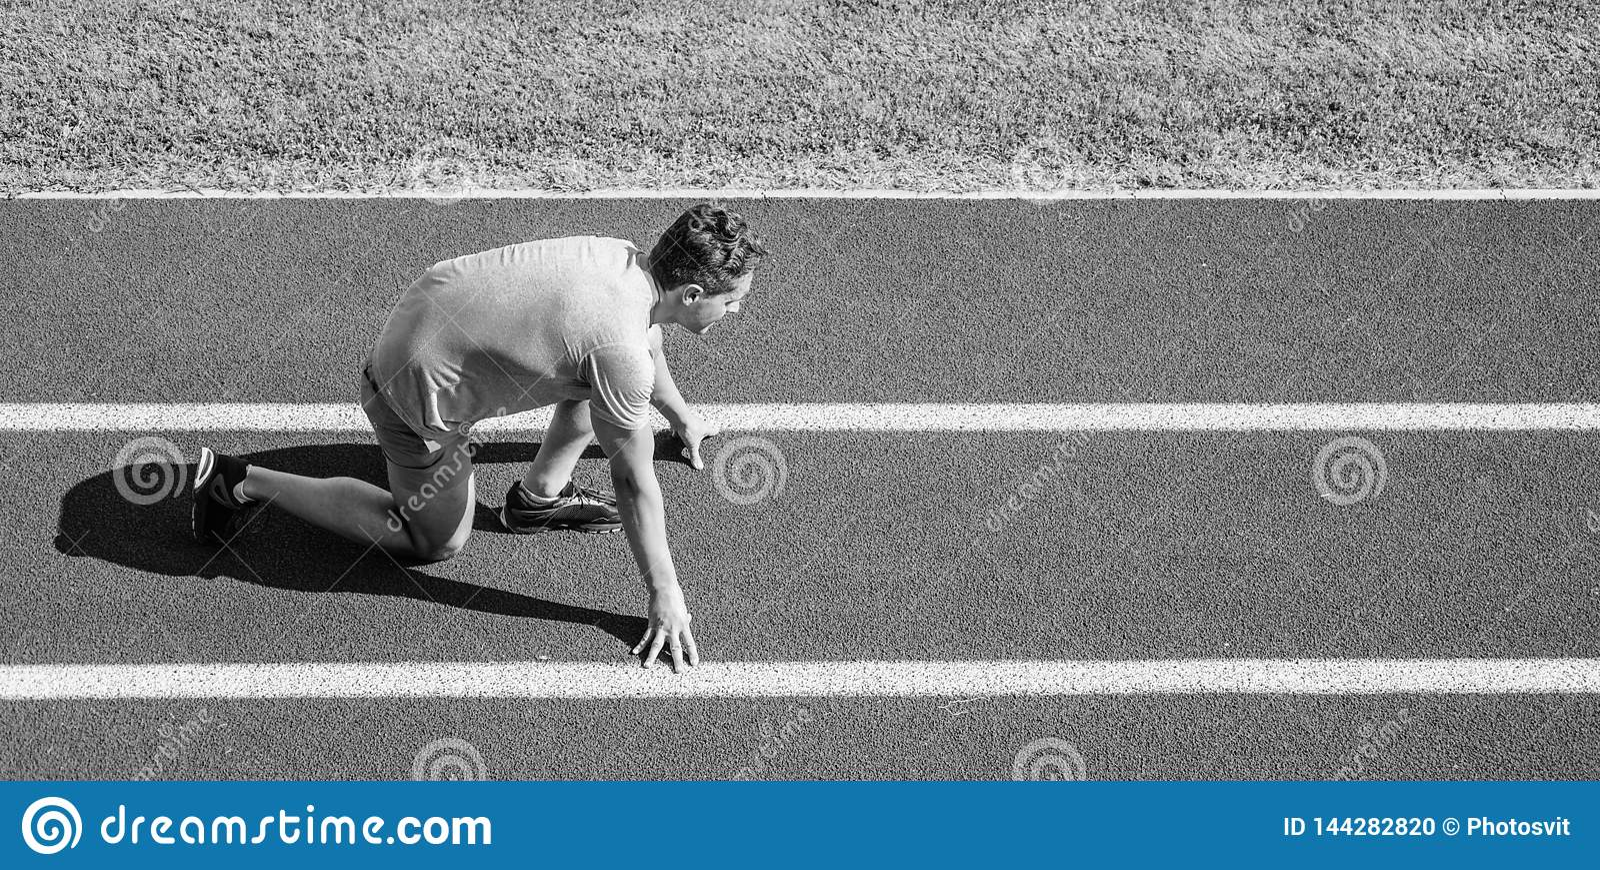 Beginning of new lifestyle habit. Runner ready to go. Athlete runner prepare to race at stadium. How to start running